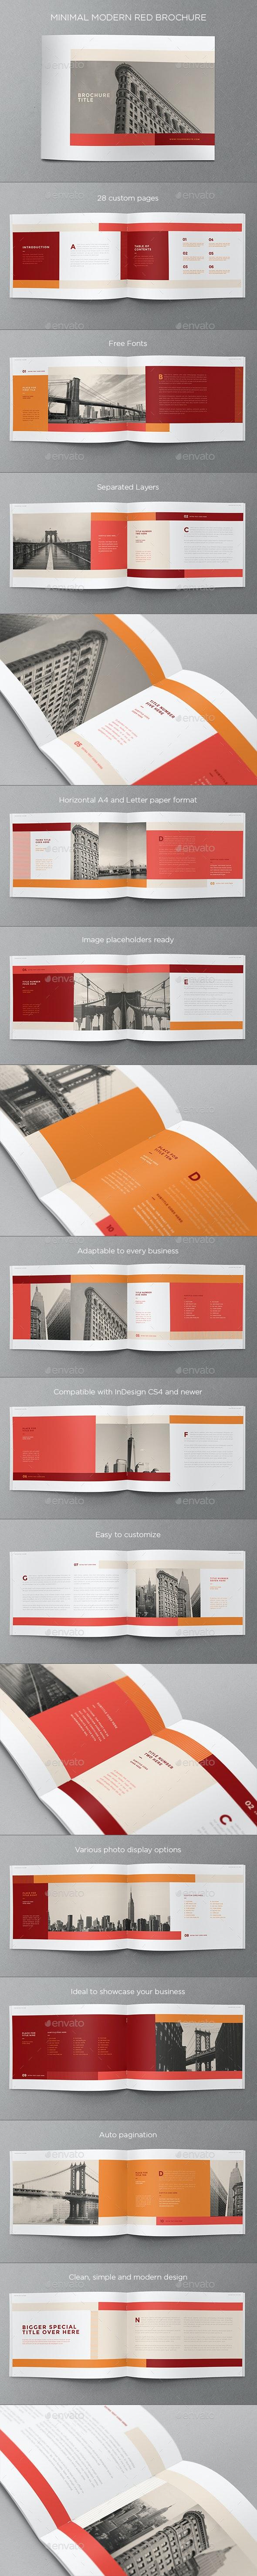 Minimal Modern Red Brochure - Brochures Print Templates